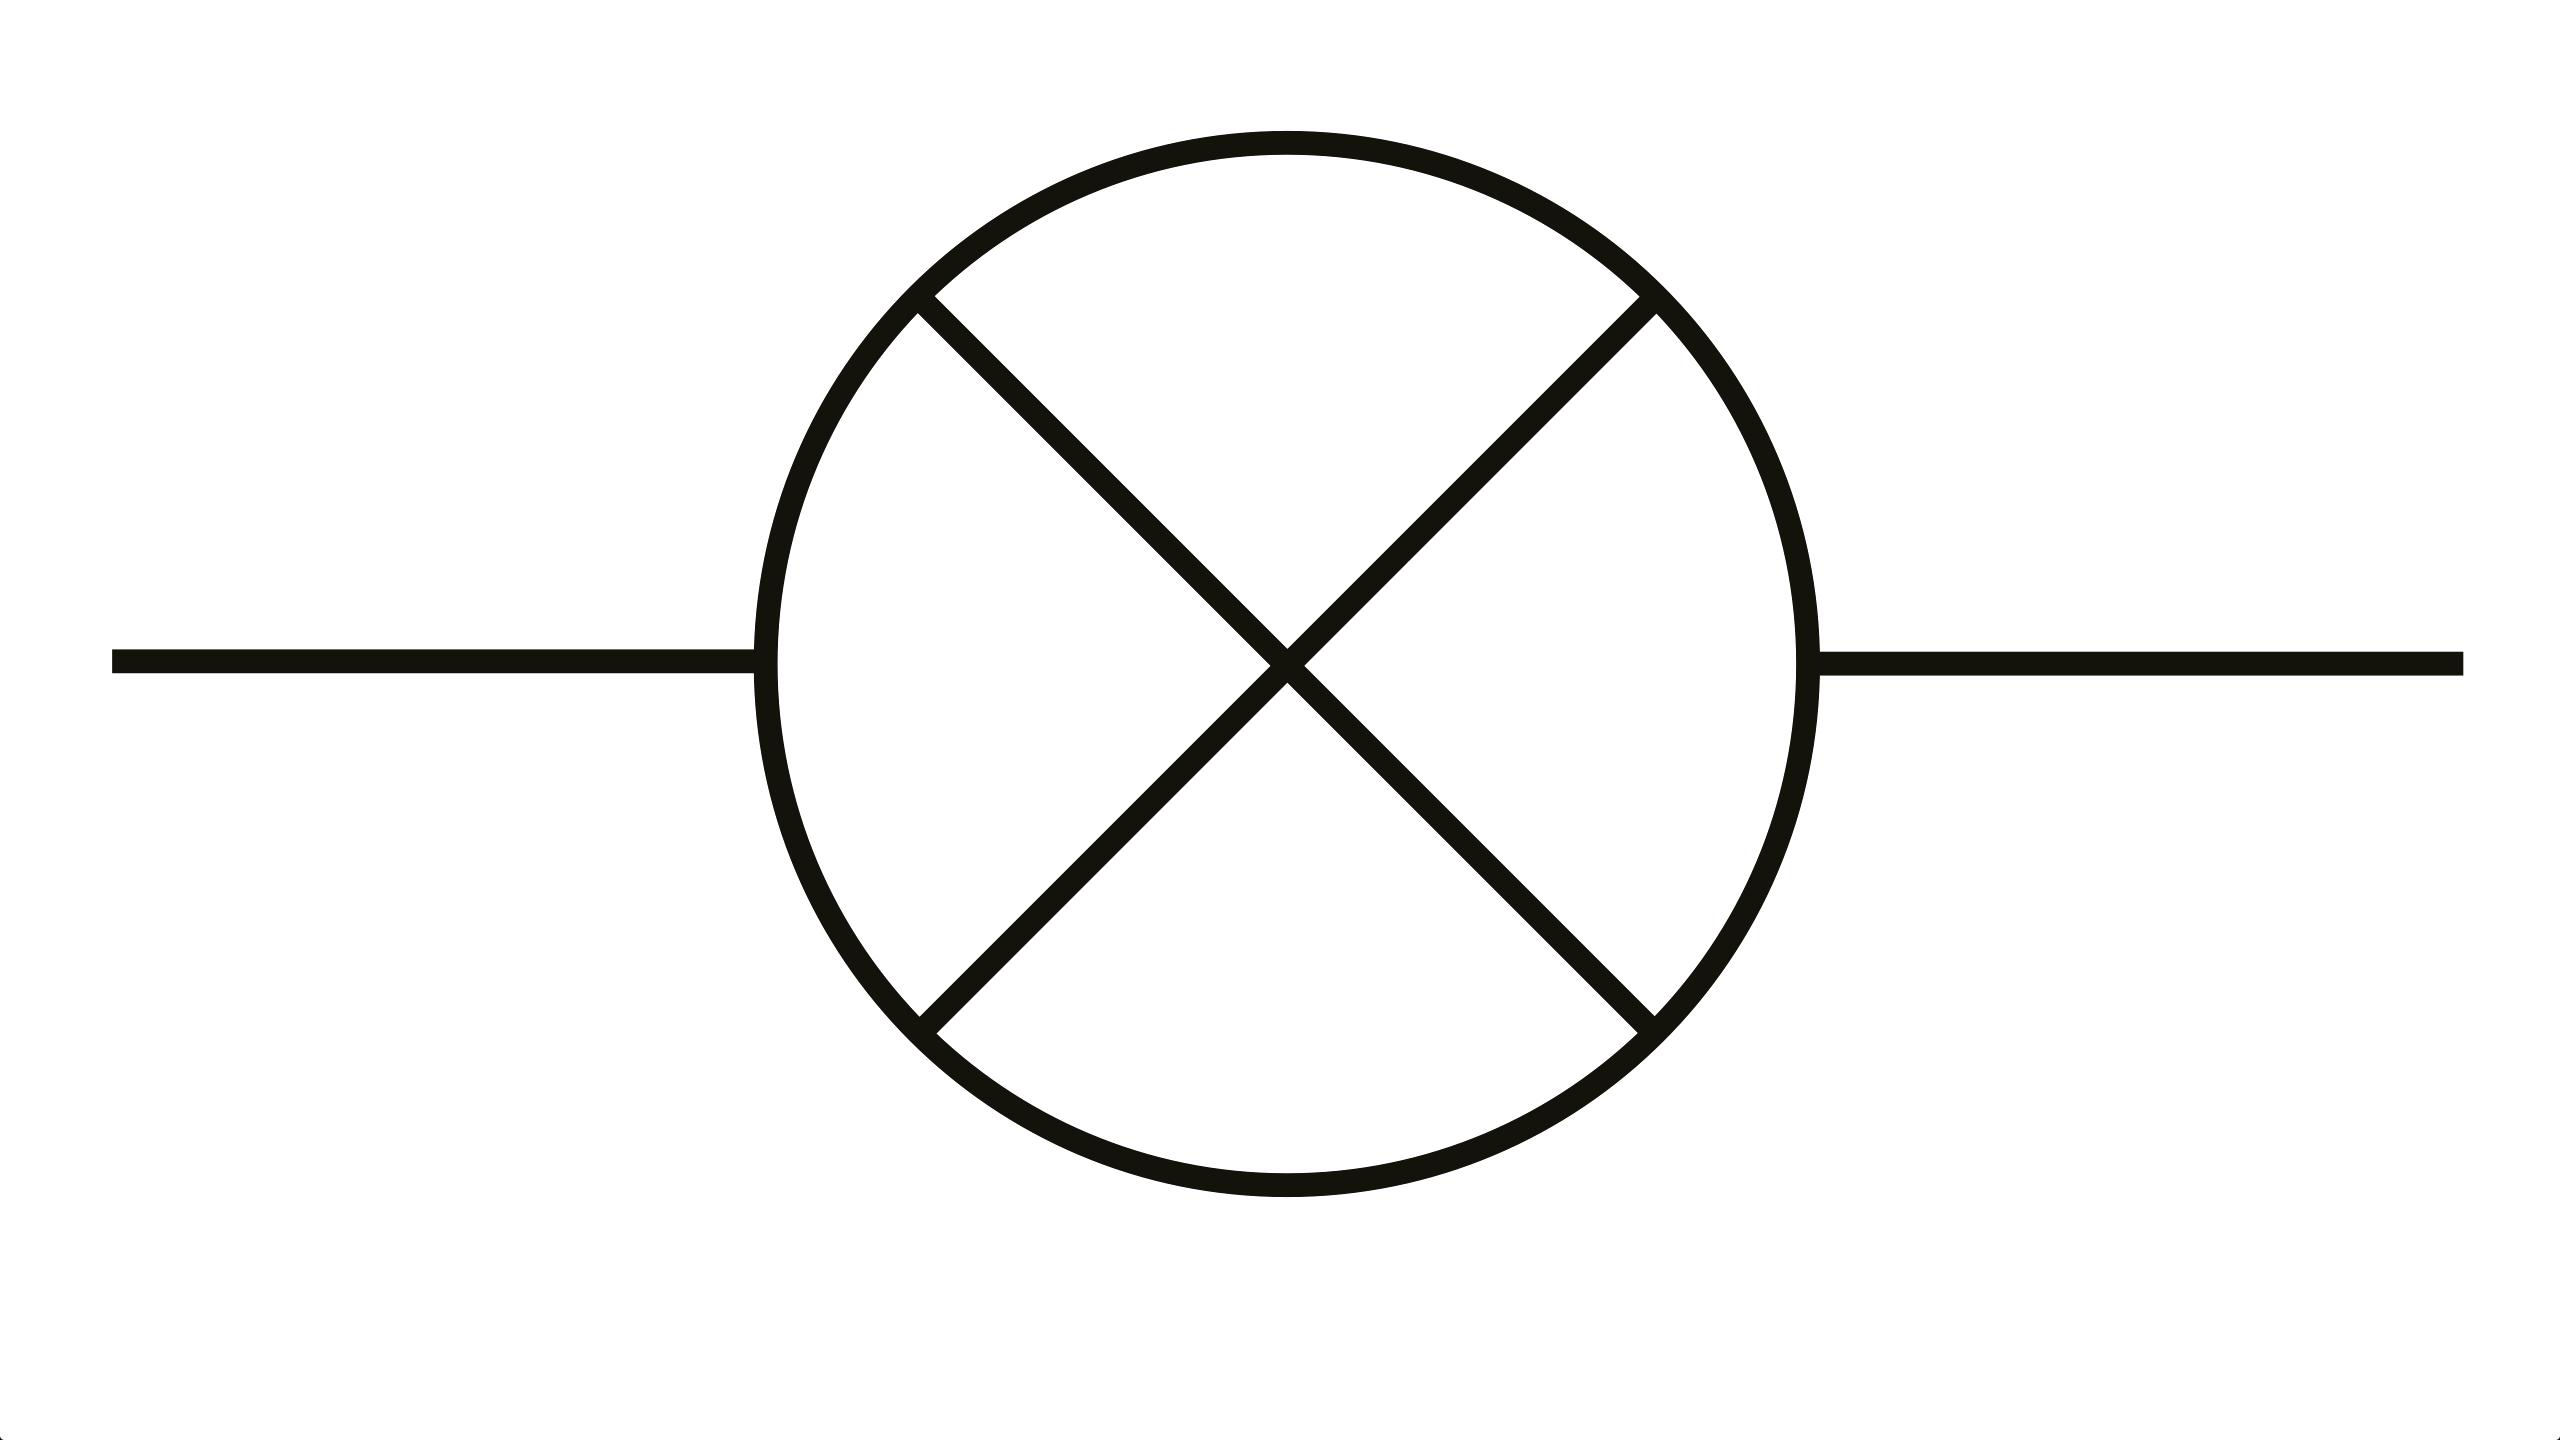 Led Symbol Wiring Diagram Cat 5 Ethernet Wiring Diagram For Wiring Diagram Schematics